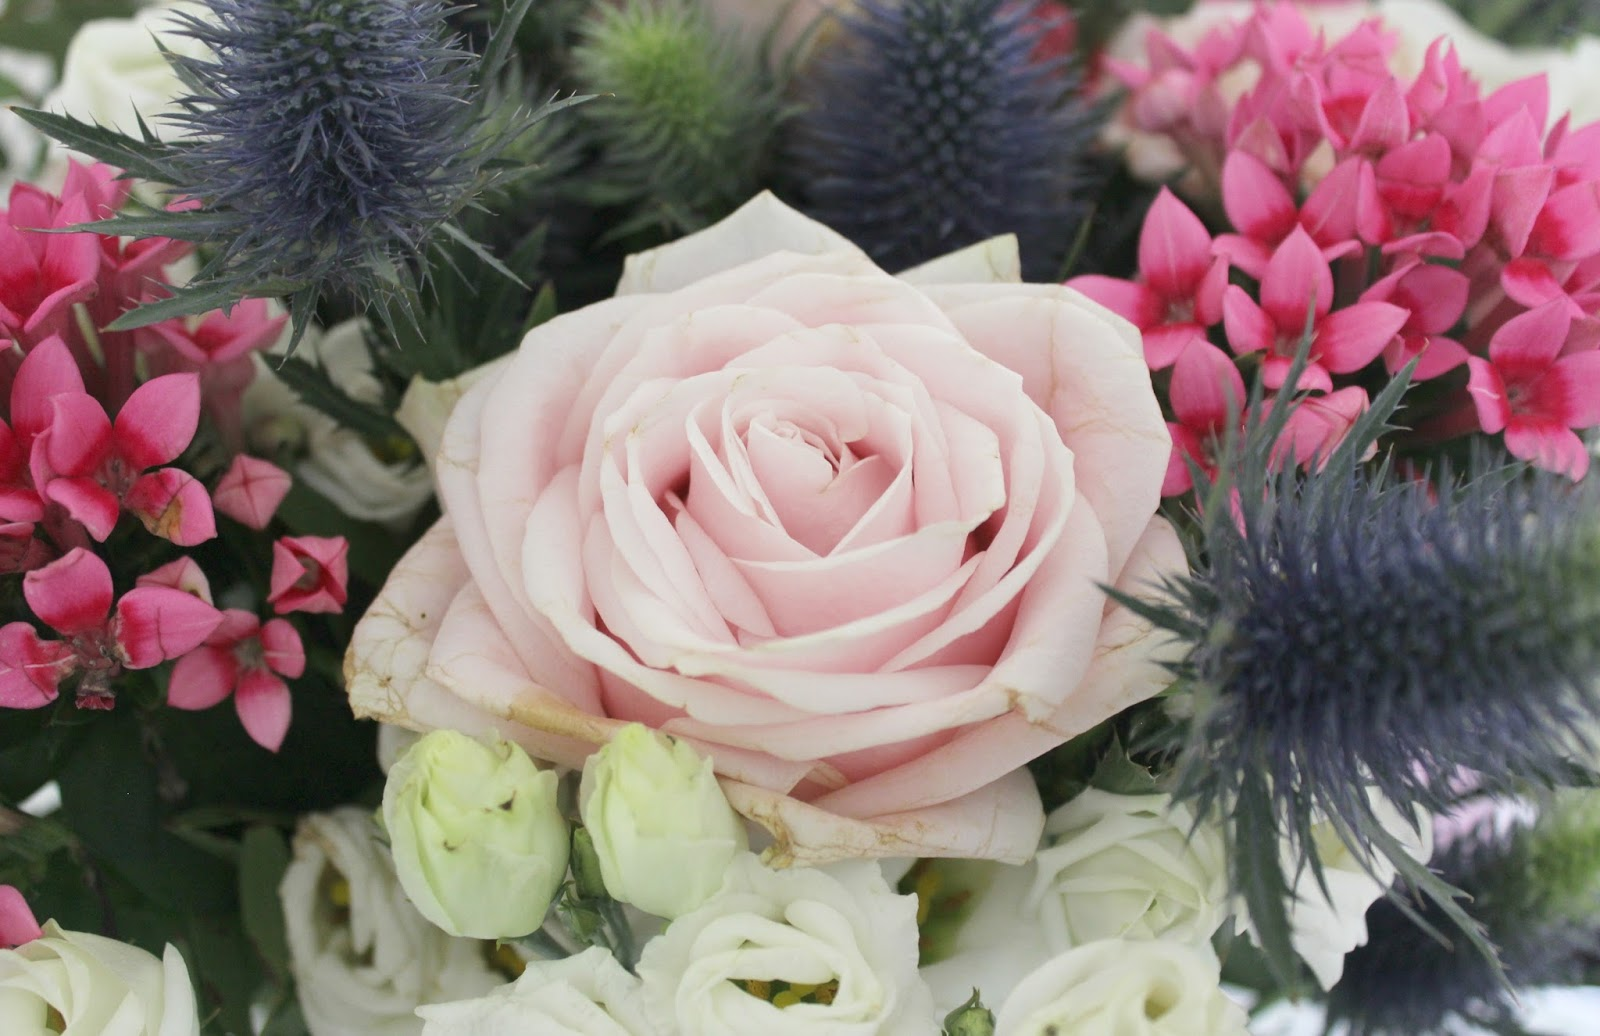 Ok bouquet sophia luxury bouquet tattooed tealady ok bouquet sophia luxury bouquet izmirmasajfo Choice Image